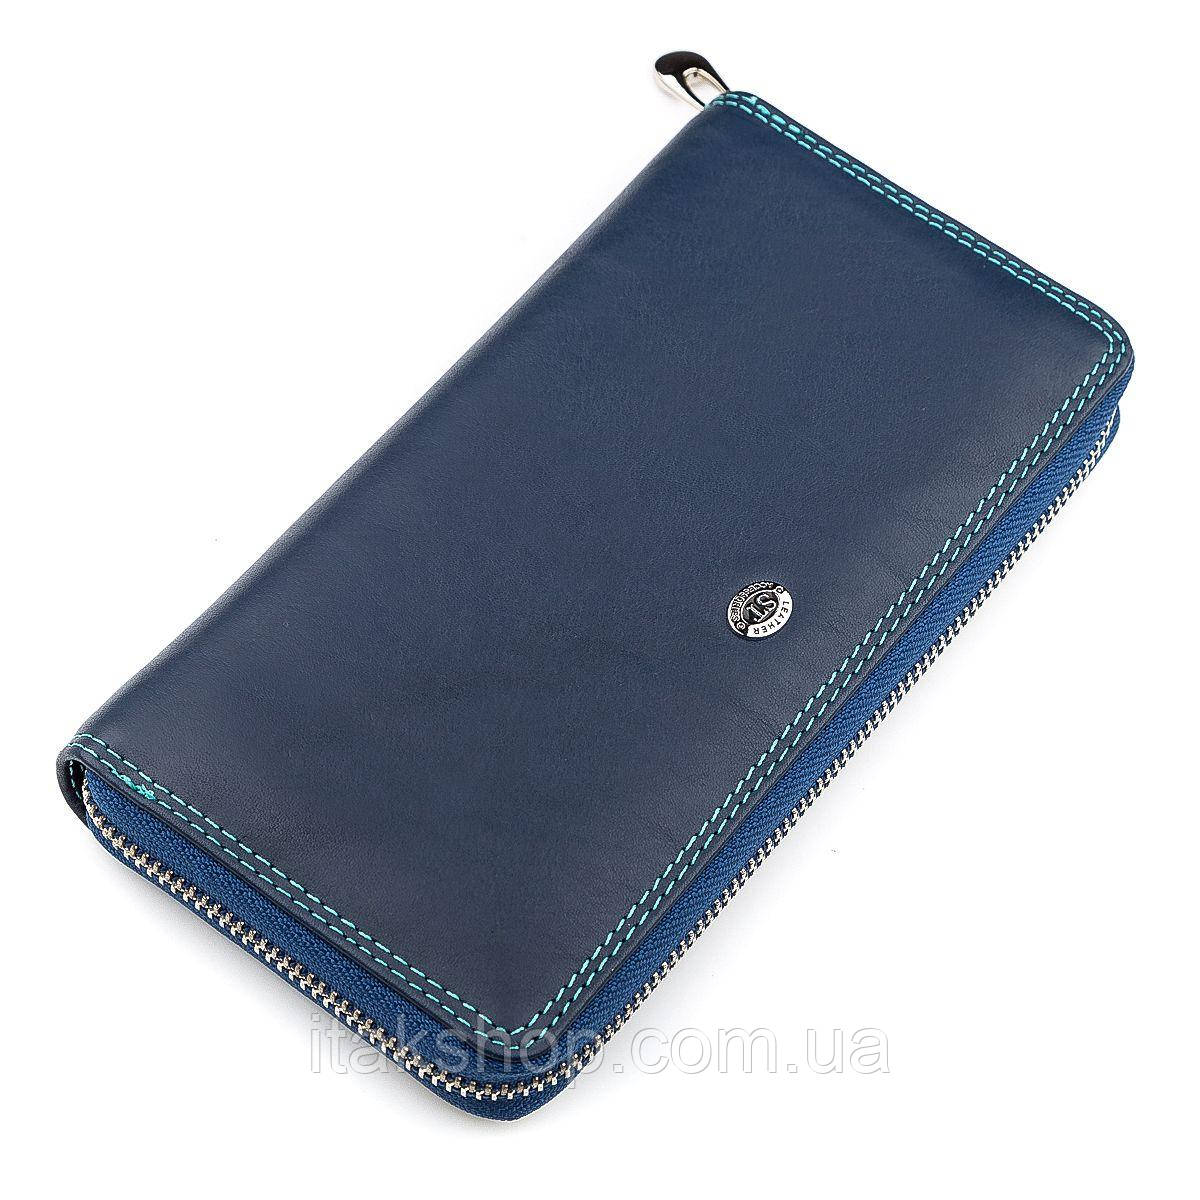 Кошелек женский ST Leather 18375 (SB71) на молнии Синий, Синий